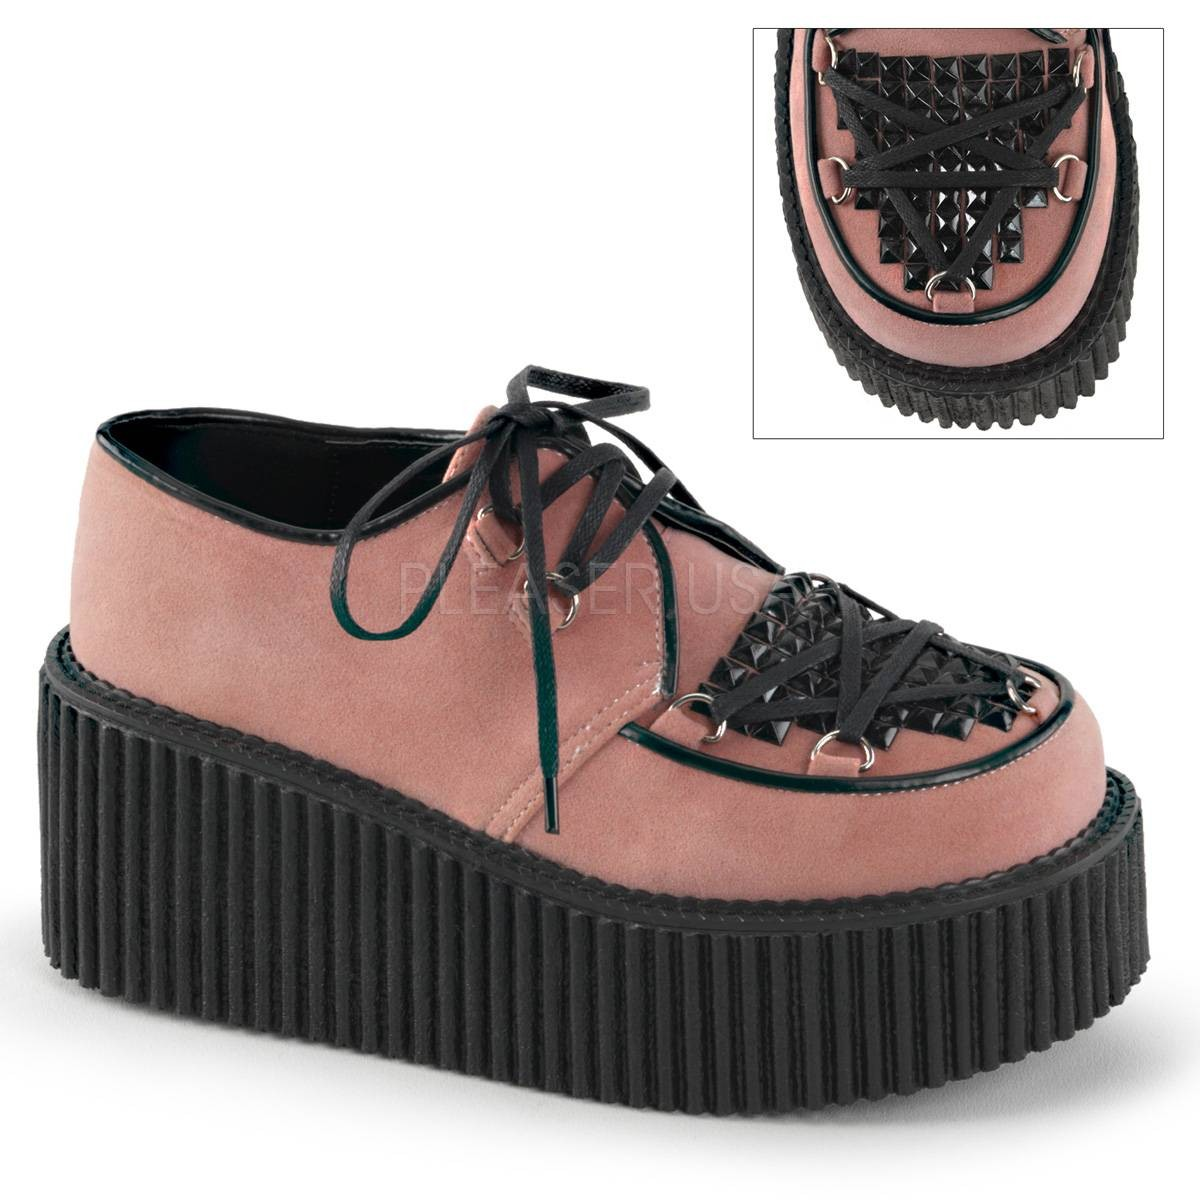 Halbschuhe - CREEPER 216 ° Damen Creeper ° Pink Schwarz Matt ° Demonia  - Onlineshop RedSixty